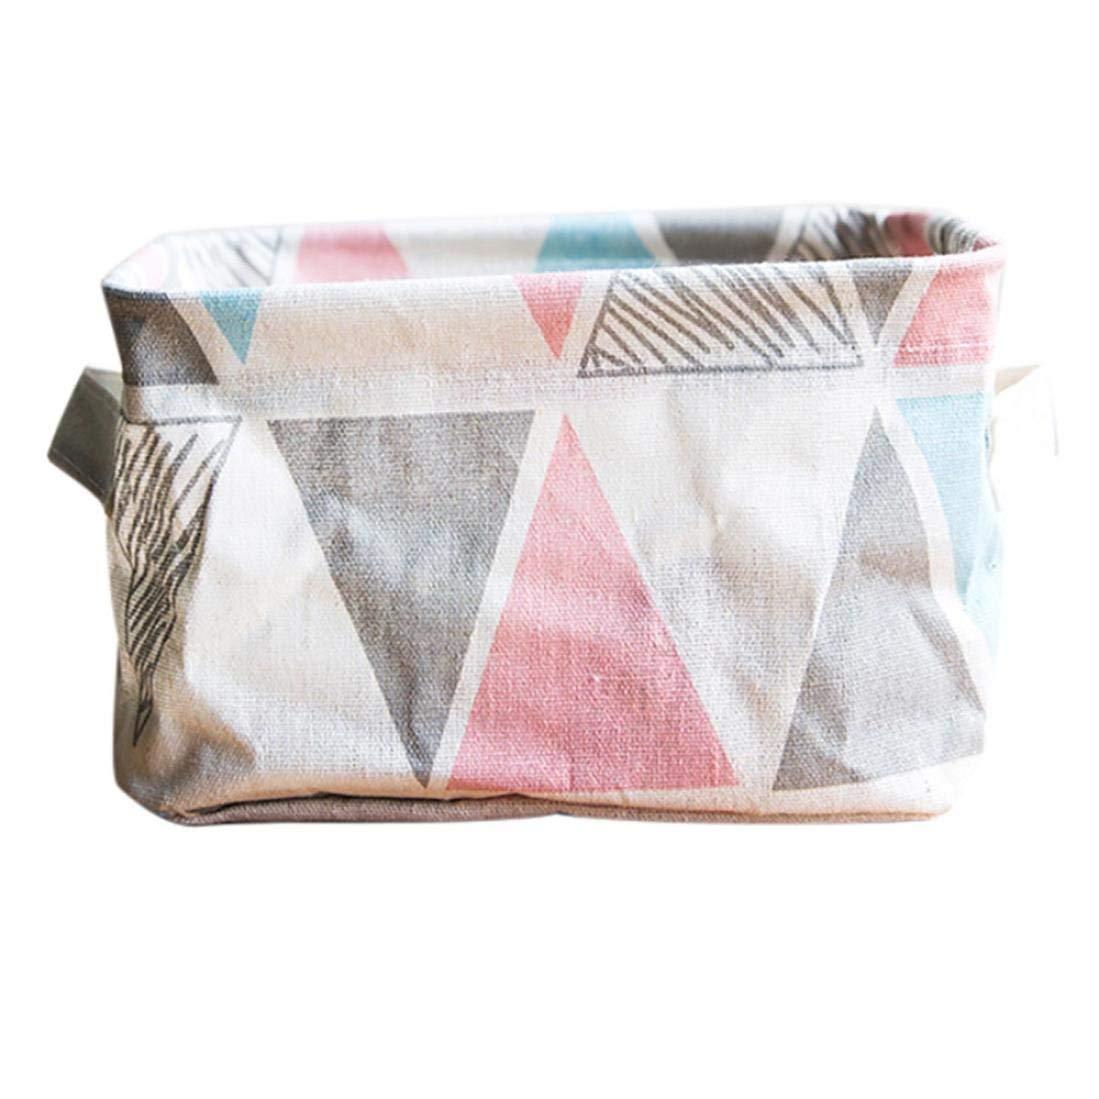 Storage Bins,Yezijin Foldable Colors Storage Bin Closet Toy Box Container Organizer Fabric Basket (Pink)